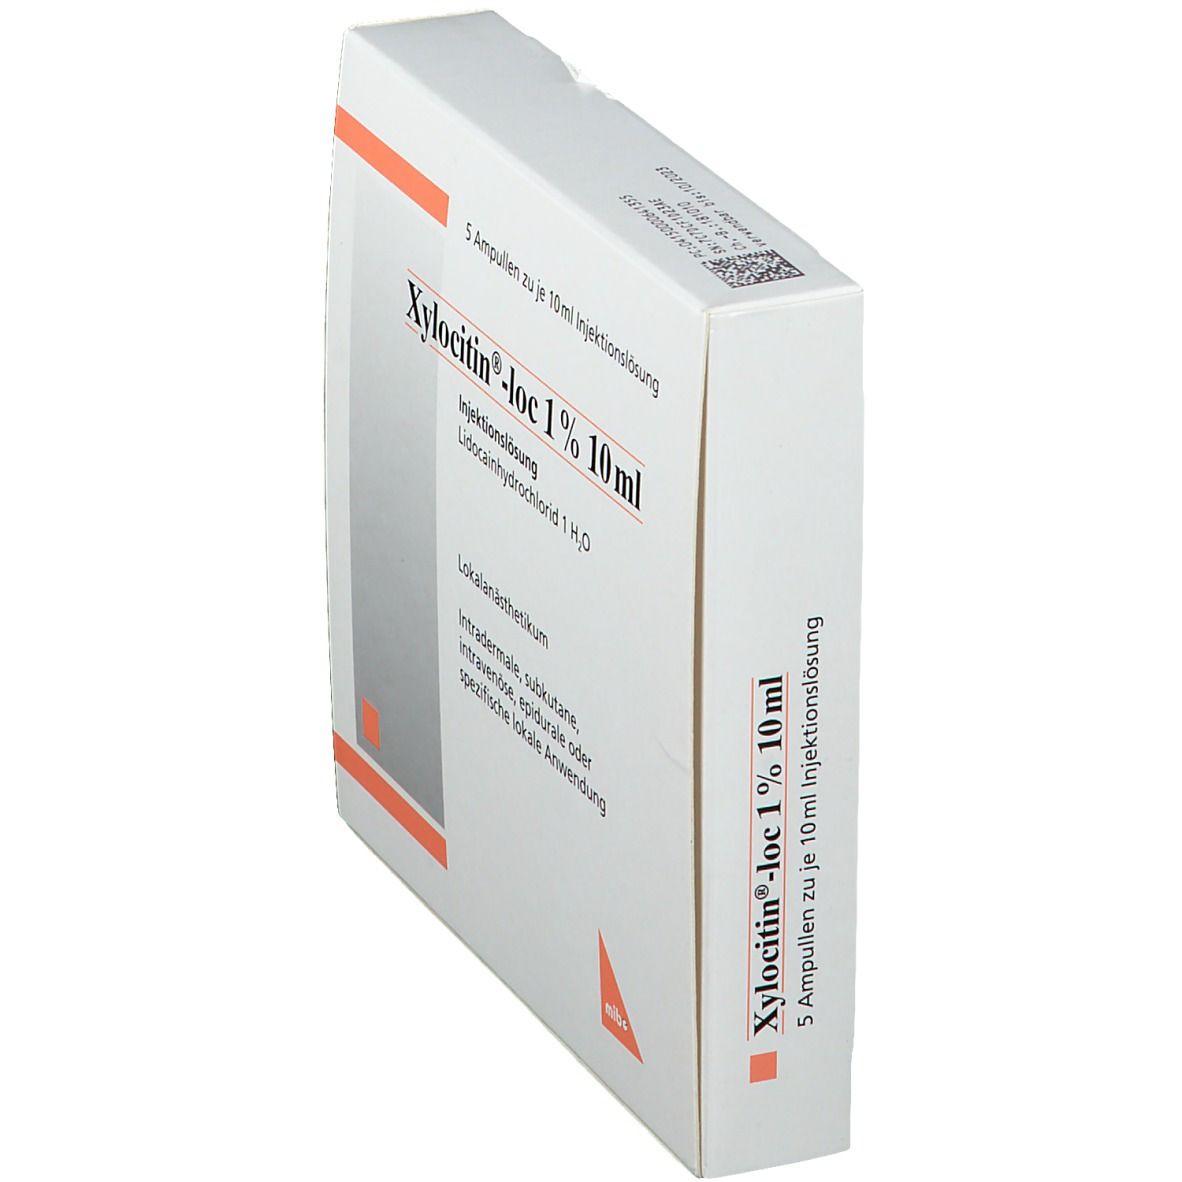 Xylocitin Loc 1% 10 ml Amp.